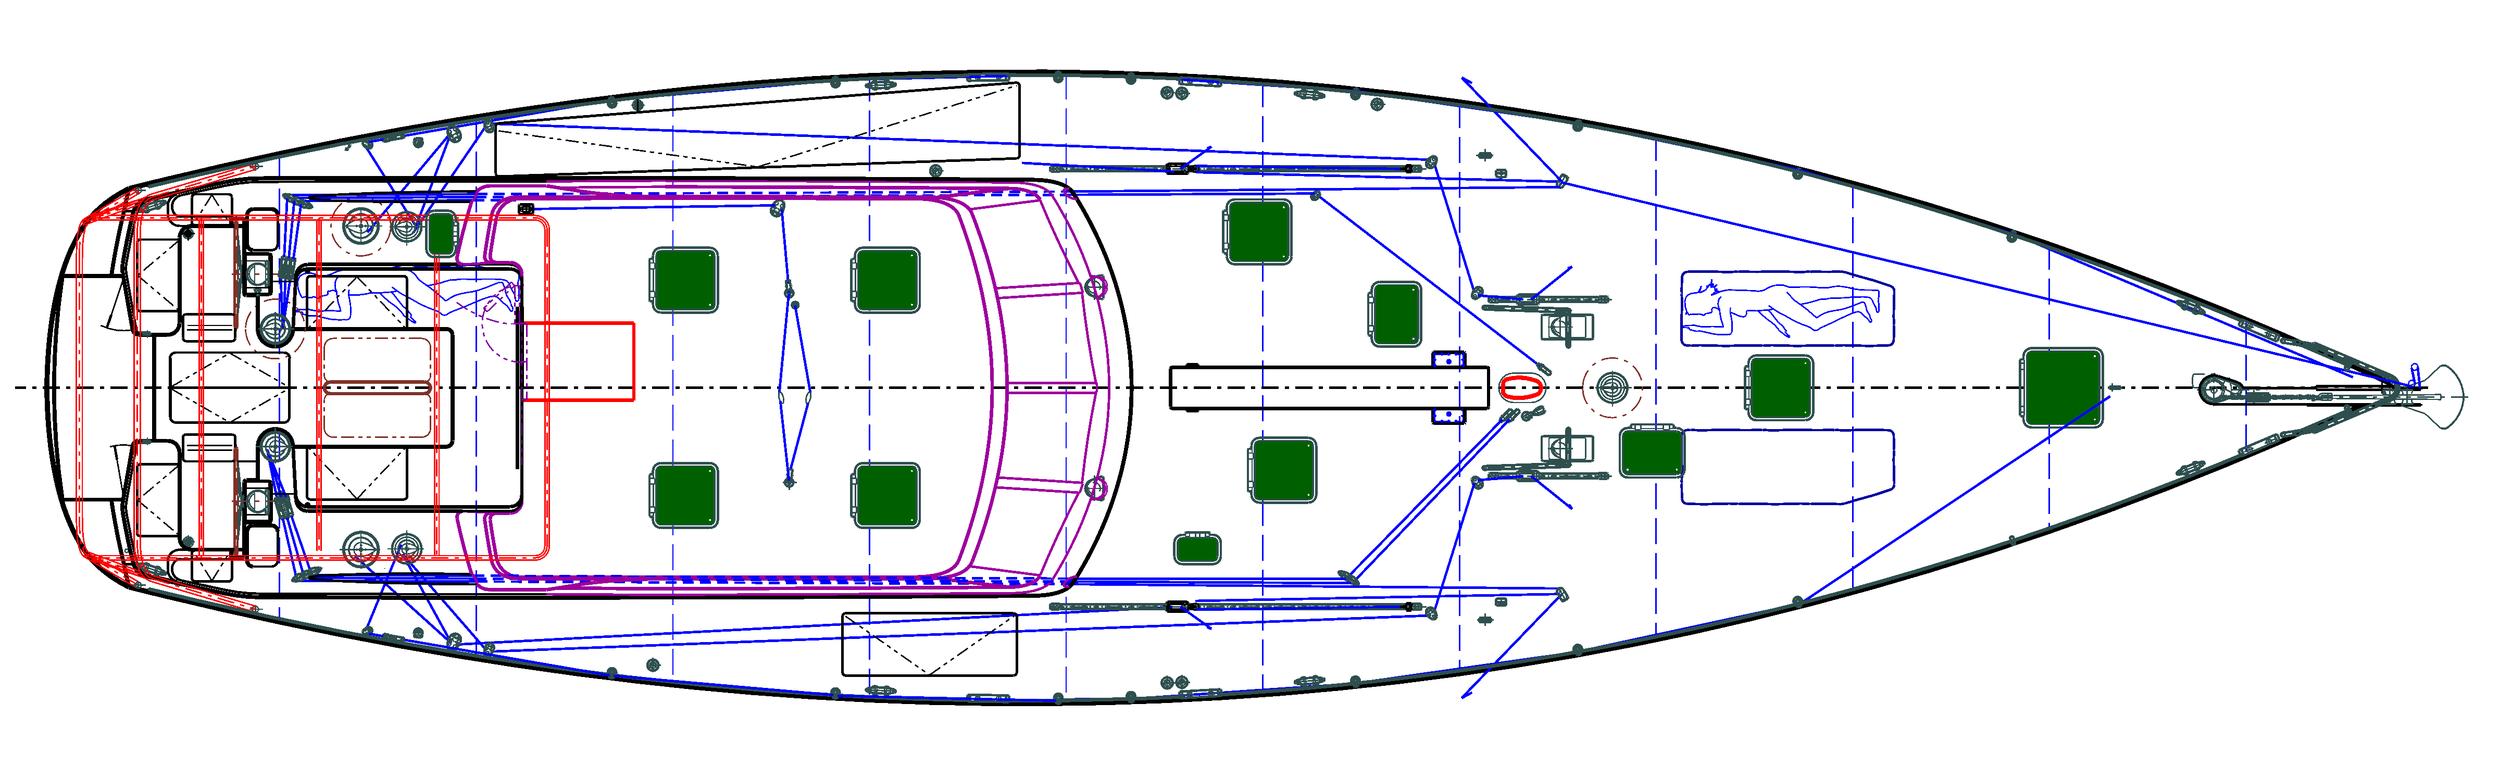 gh_65_deck_plan.png